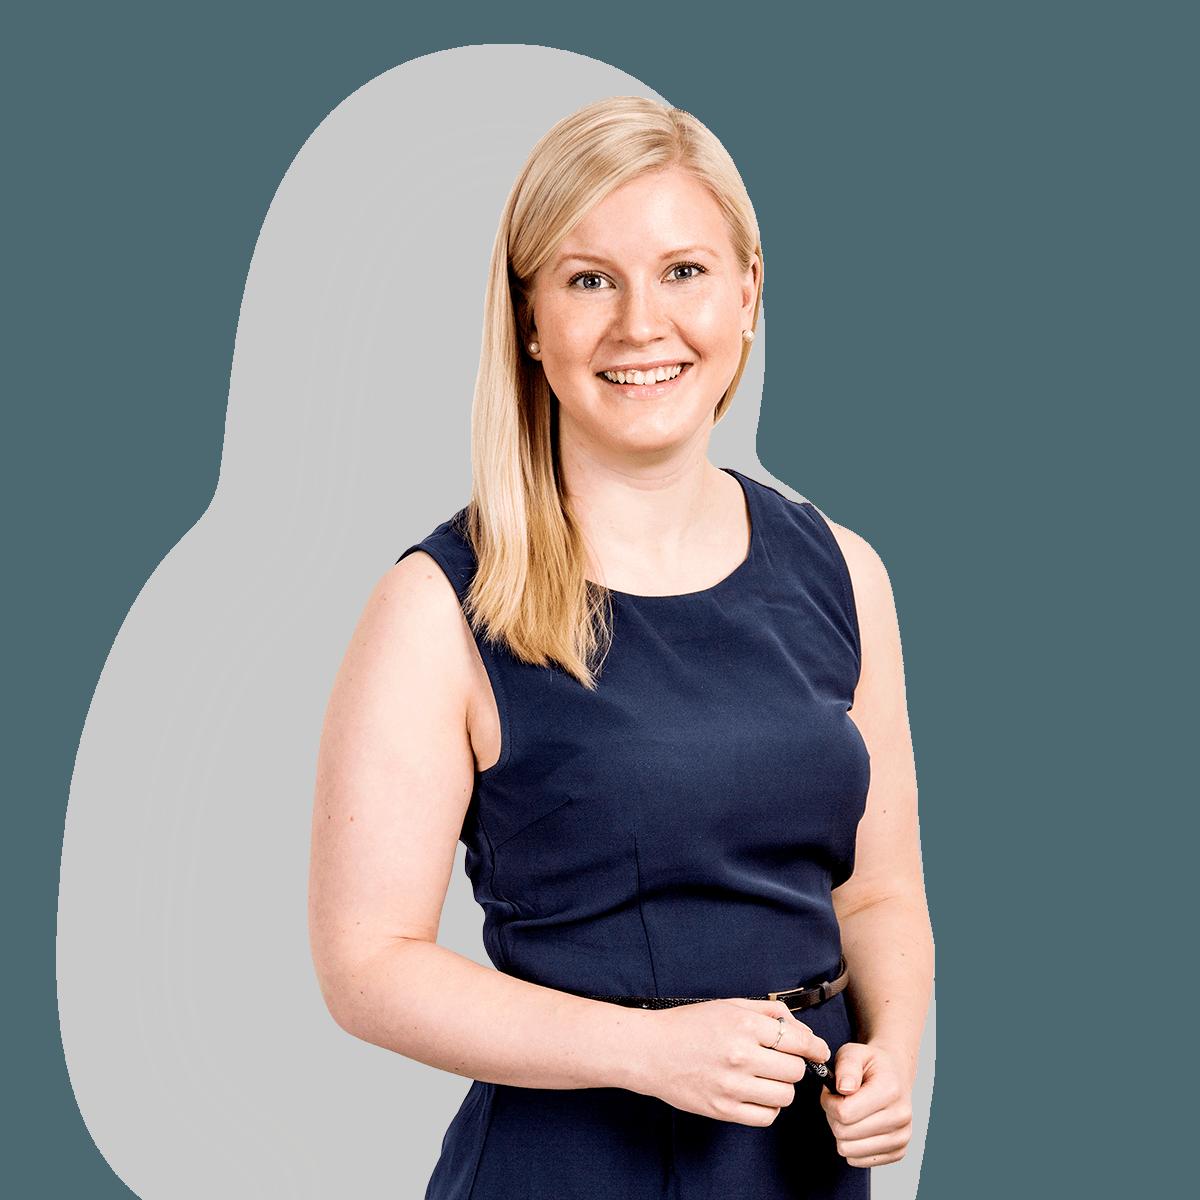 Anna Mari nude photos 2019